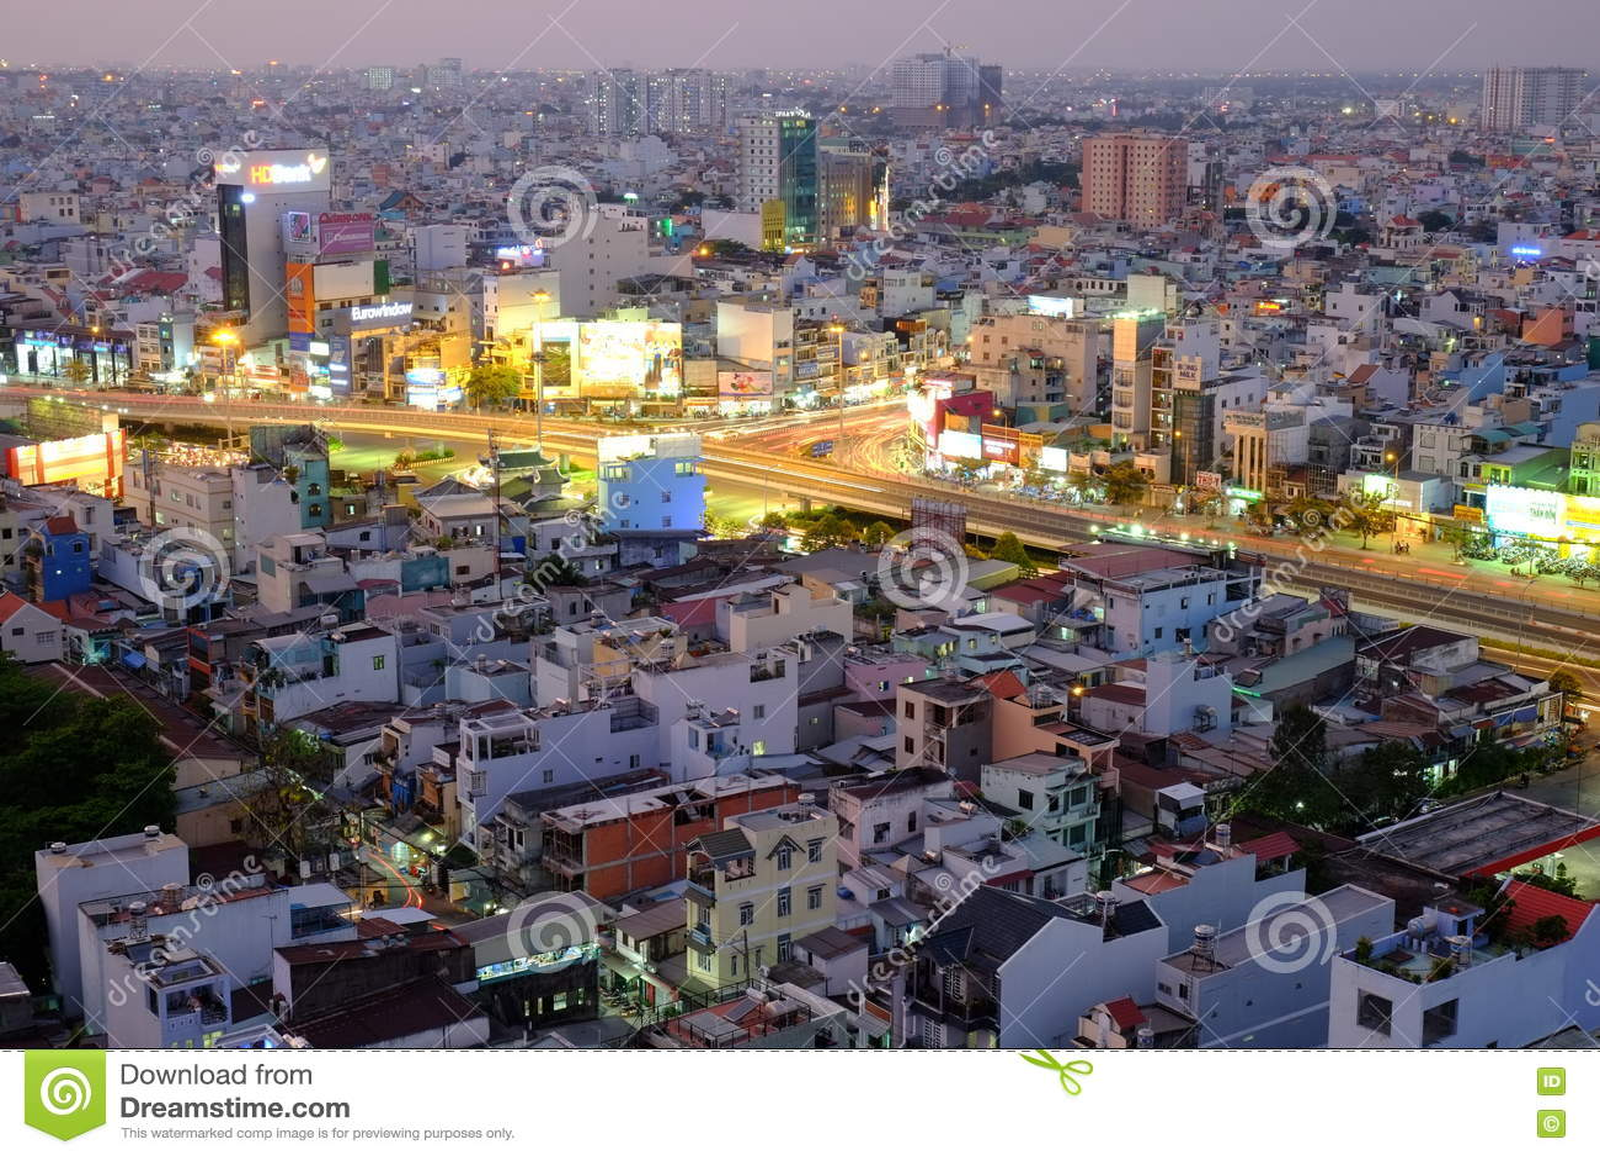 Hang Xanh intersection flyover in twilight, Ho Chi Minh city, Vietnam